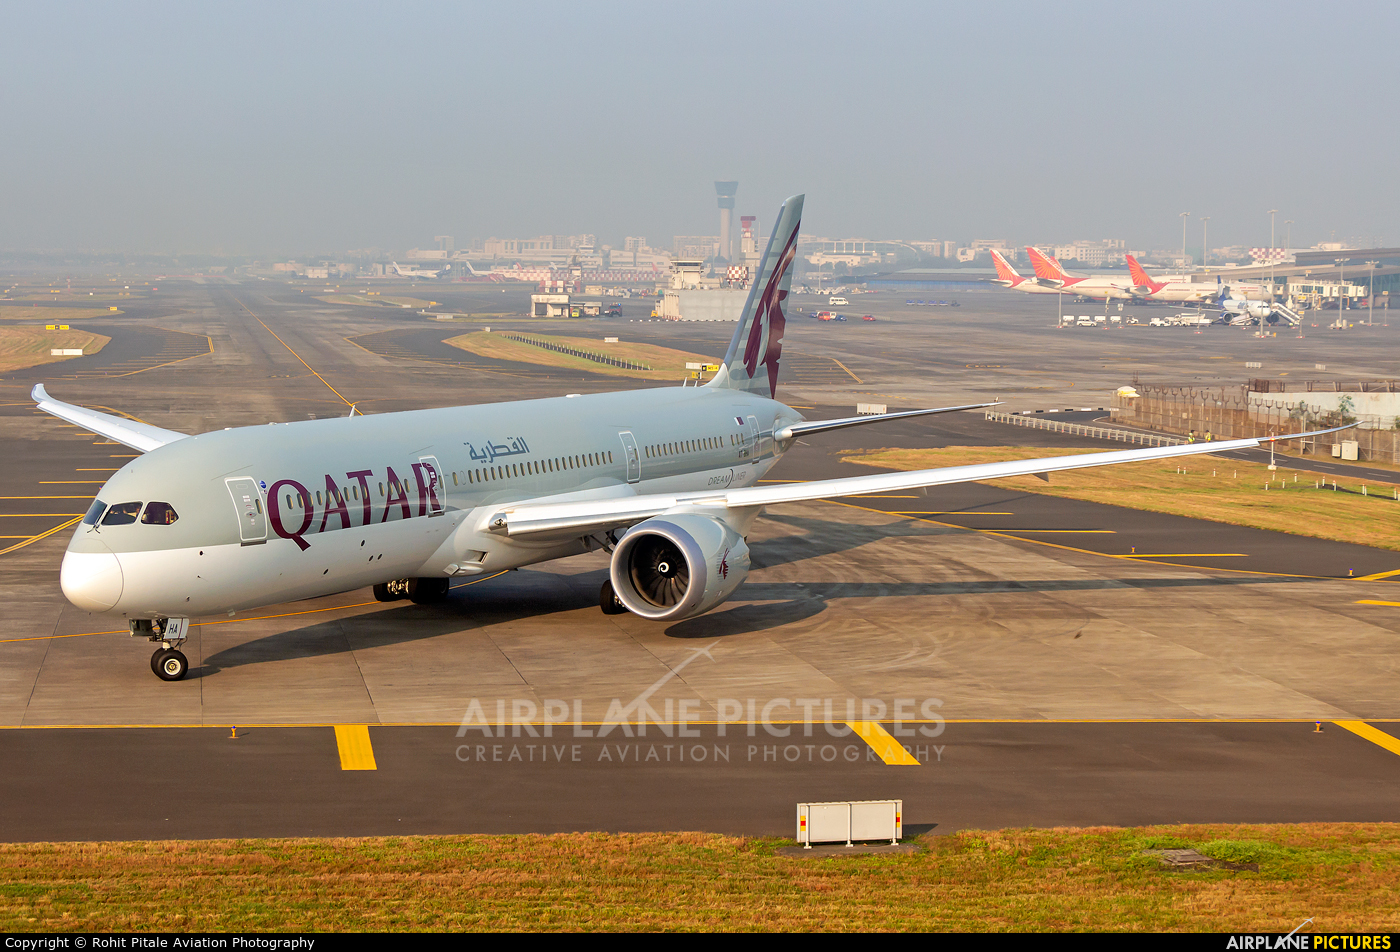 Qatar Airways A7-BHA aircraft at Mumbai - Chhatrapati Shivaji Intl